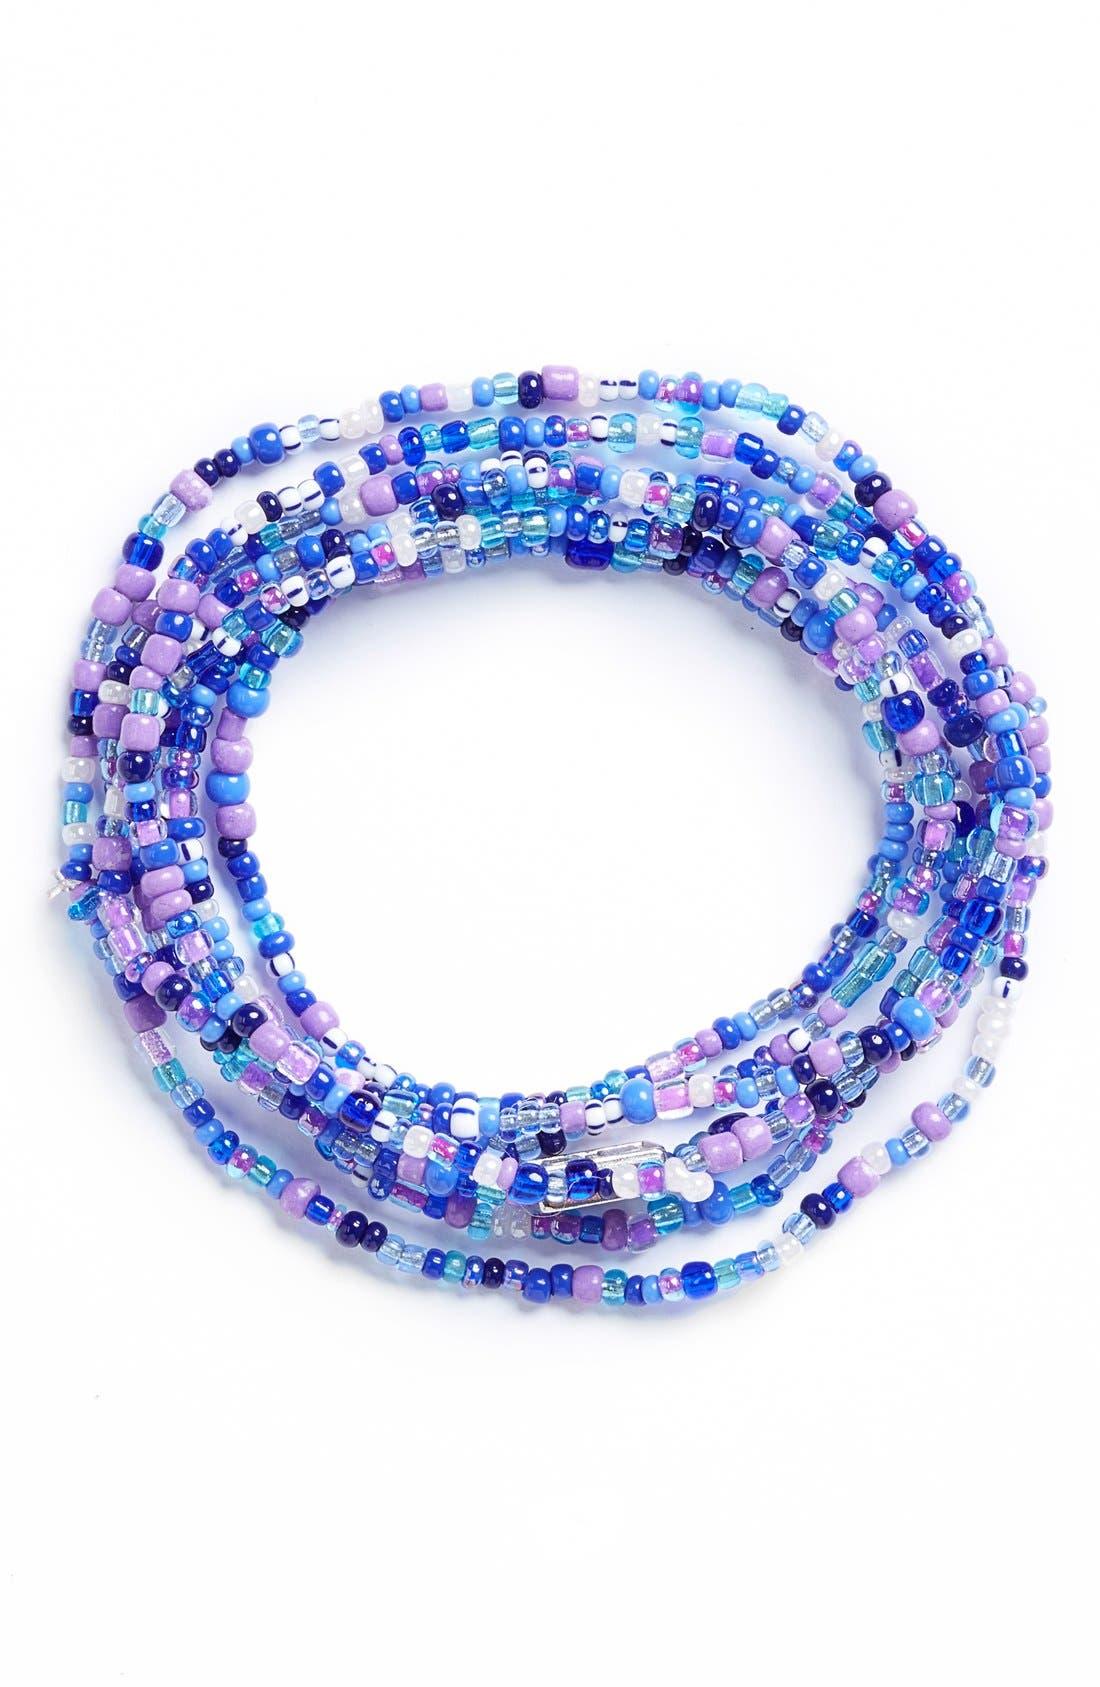 Main Image - Me to We 'Rafiki - Water' Beaded Convertible Bracelet